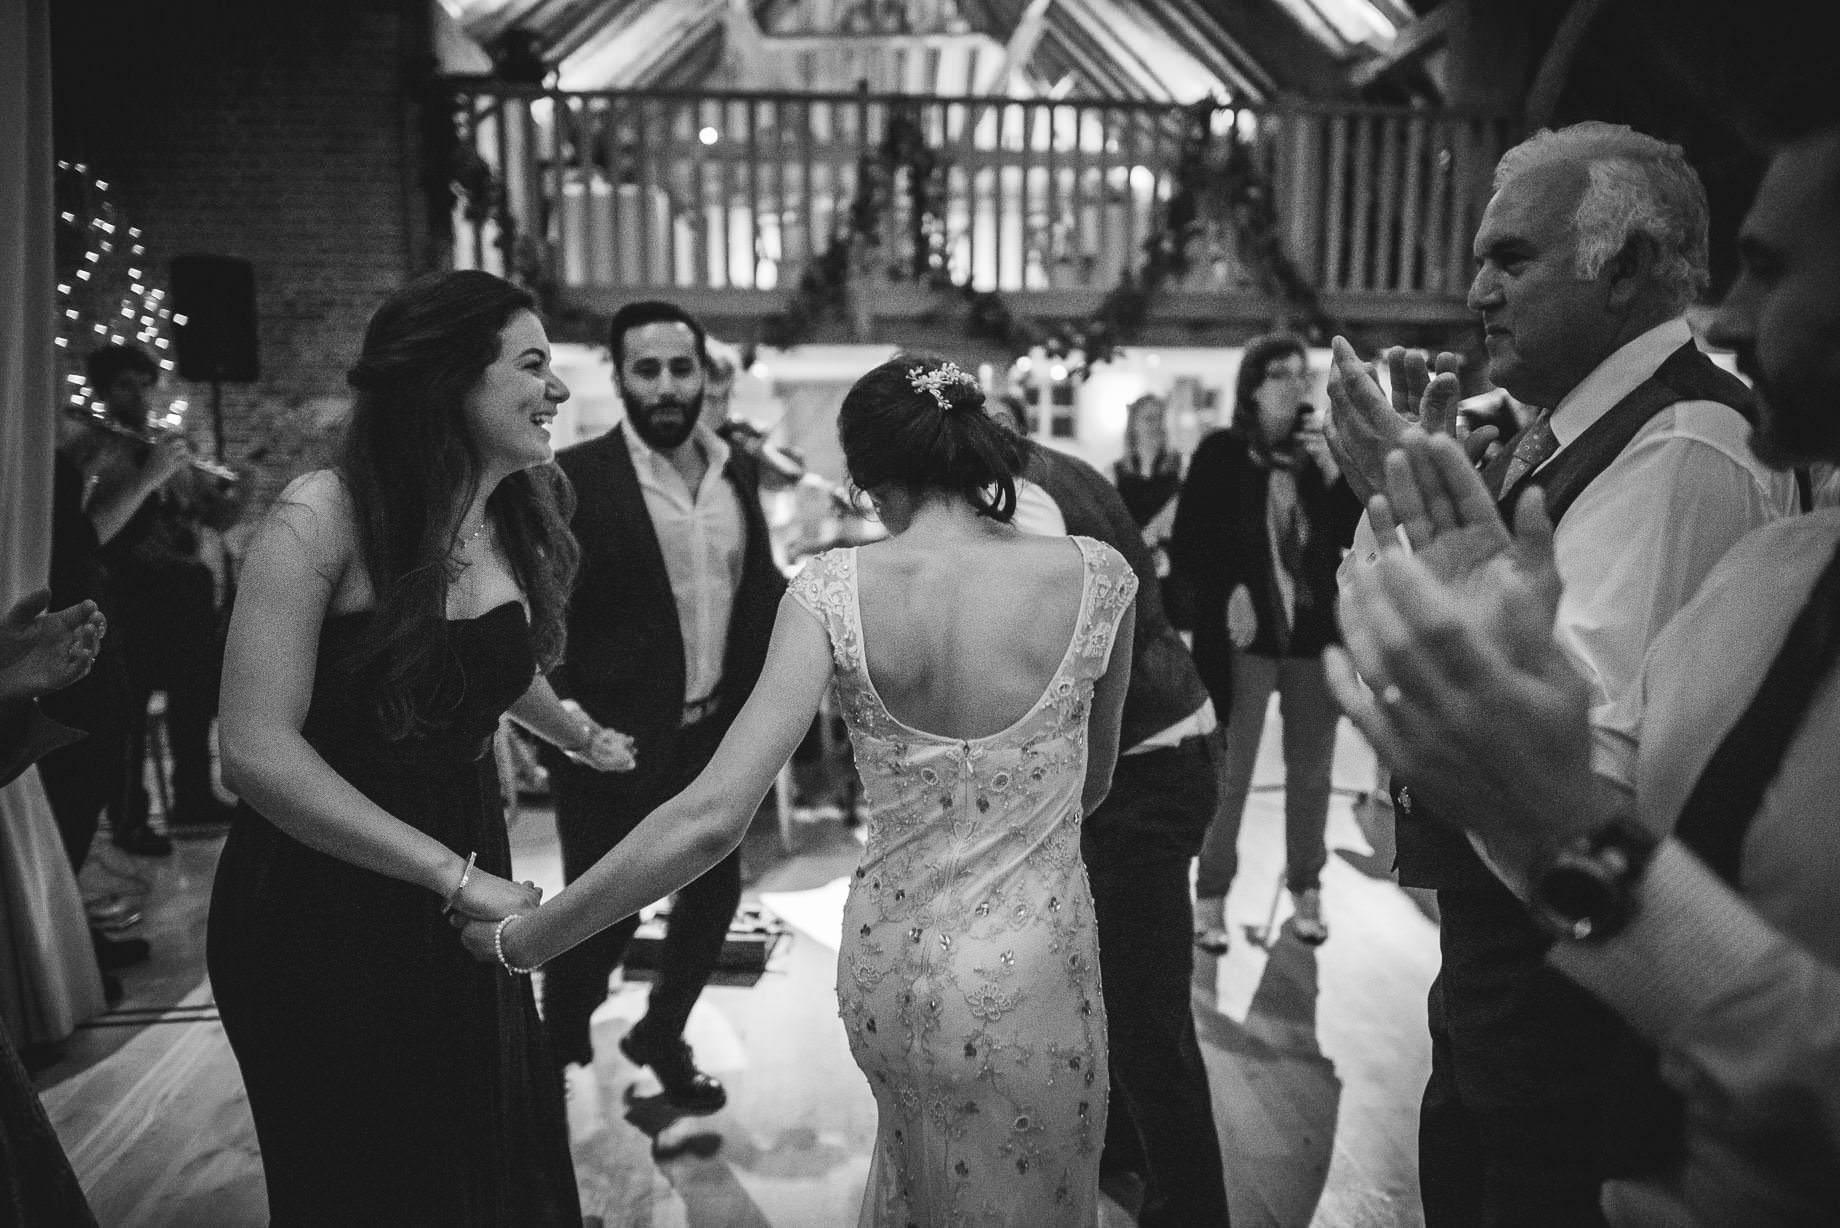 bury-court-barn-wedding-photography-guy-collier-photography-nadia-tom-180-of-184